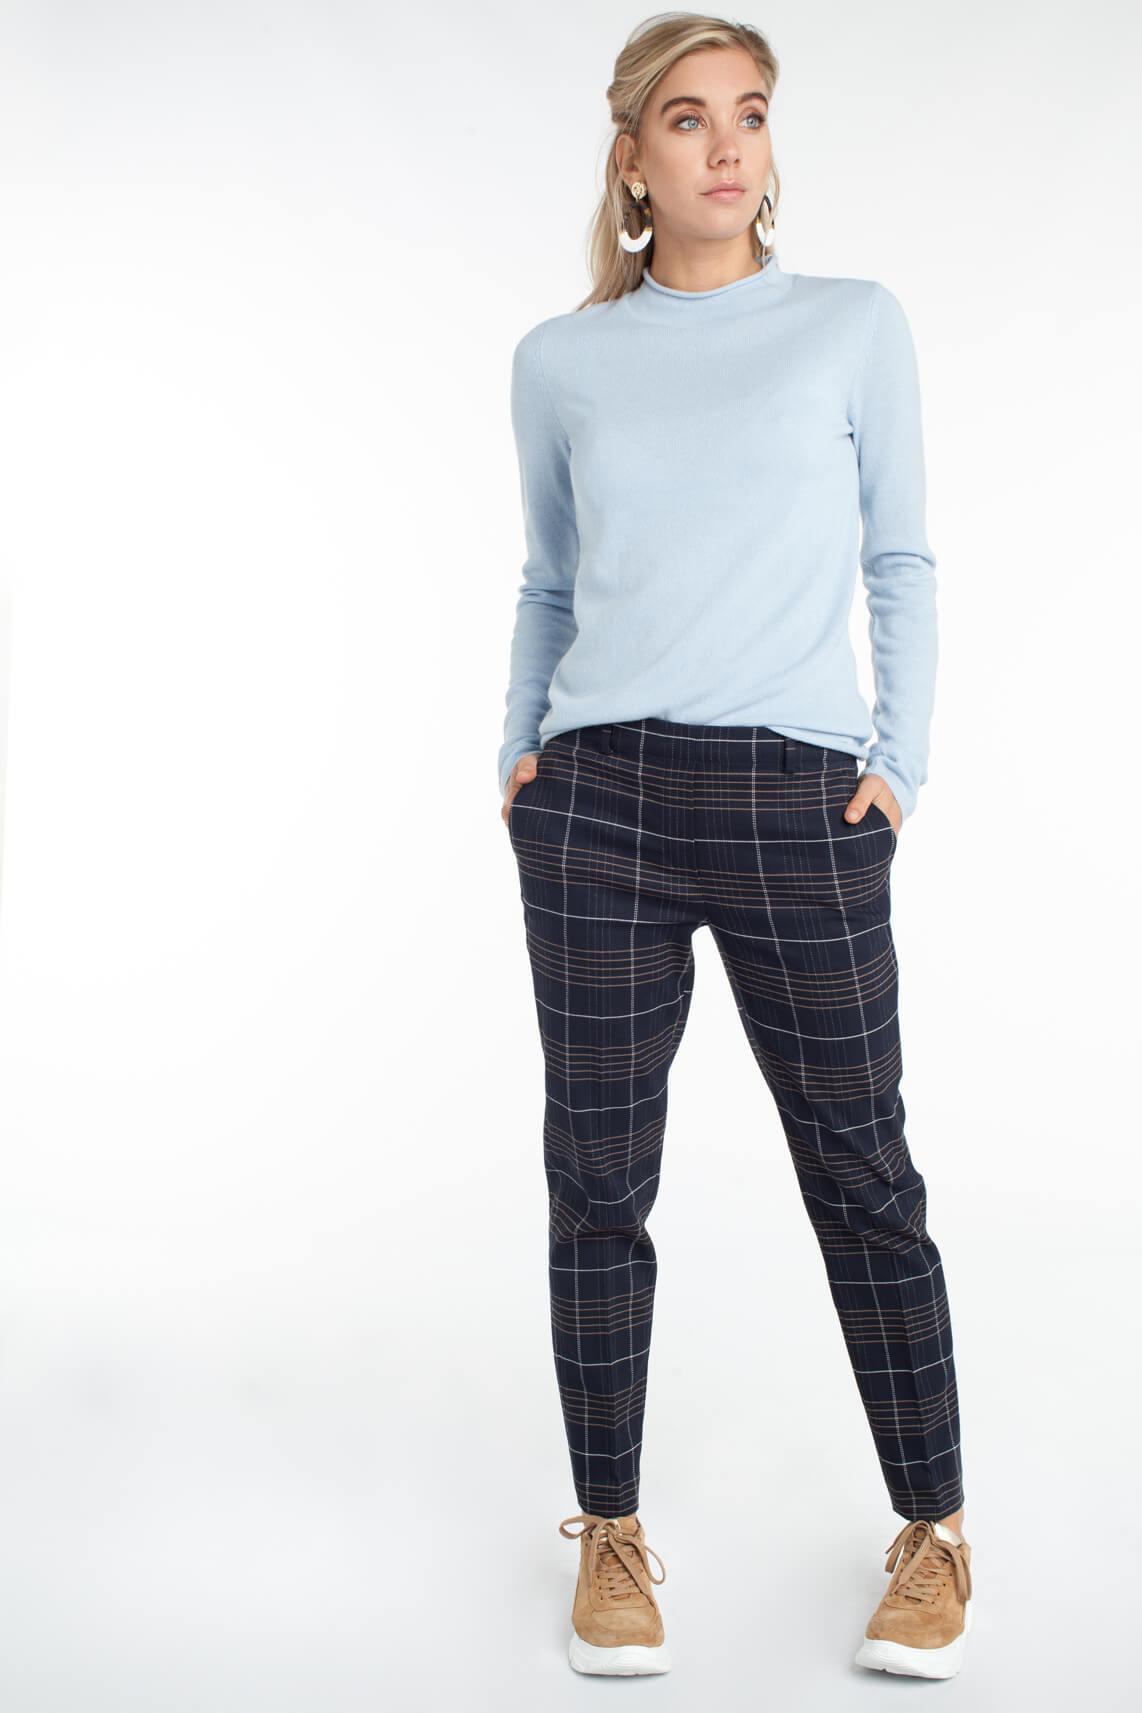 Marc O'Polo Dames Jogpantalon Blauw